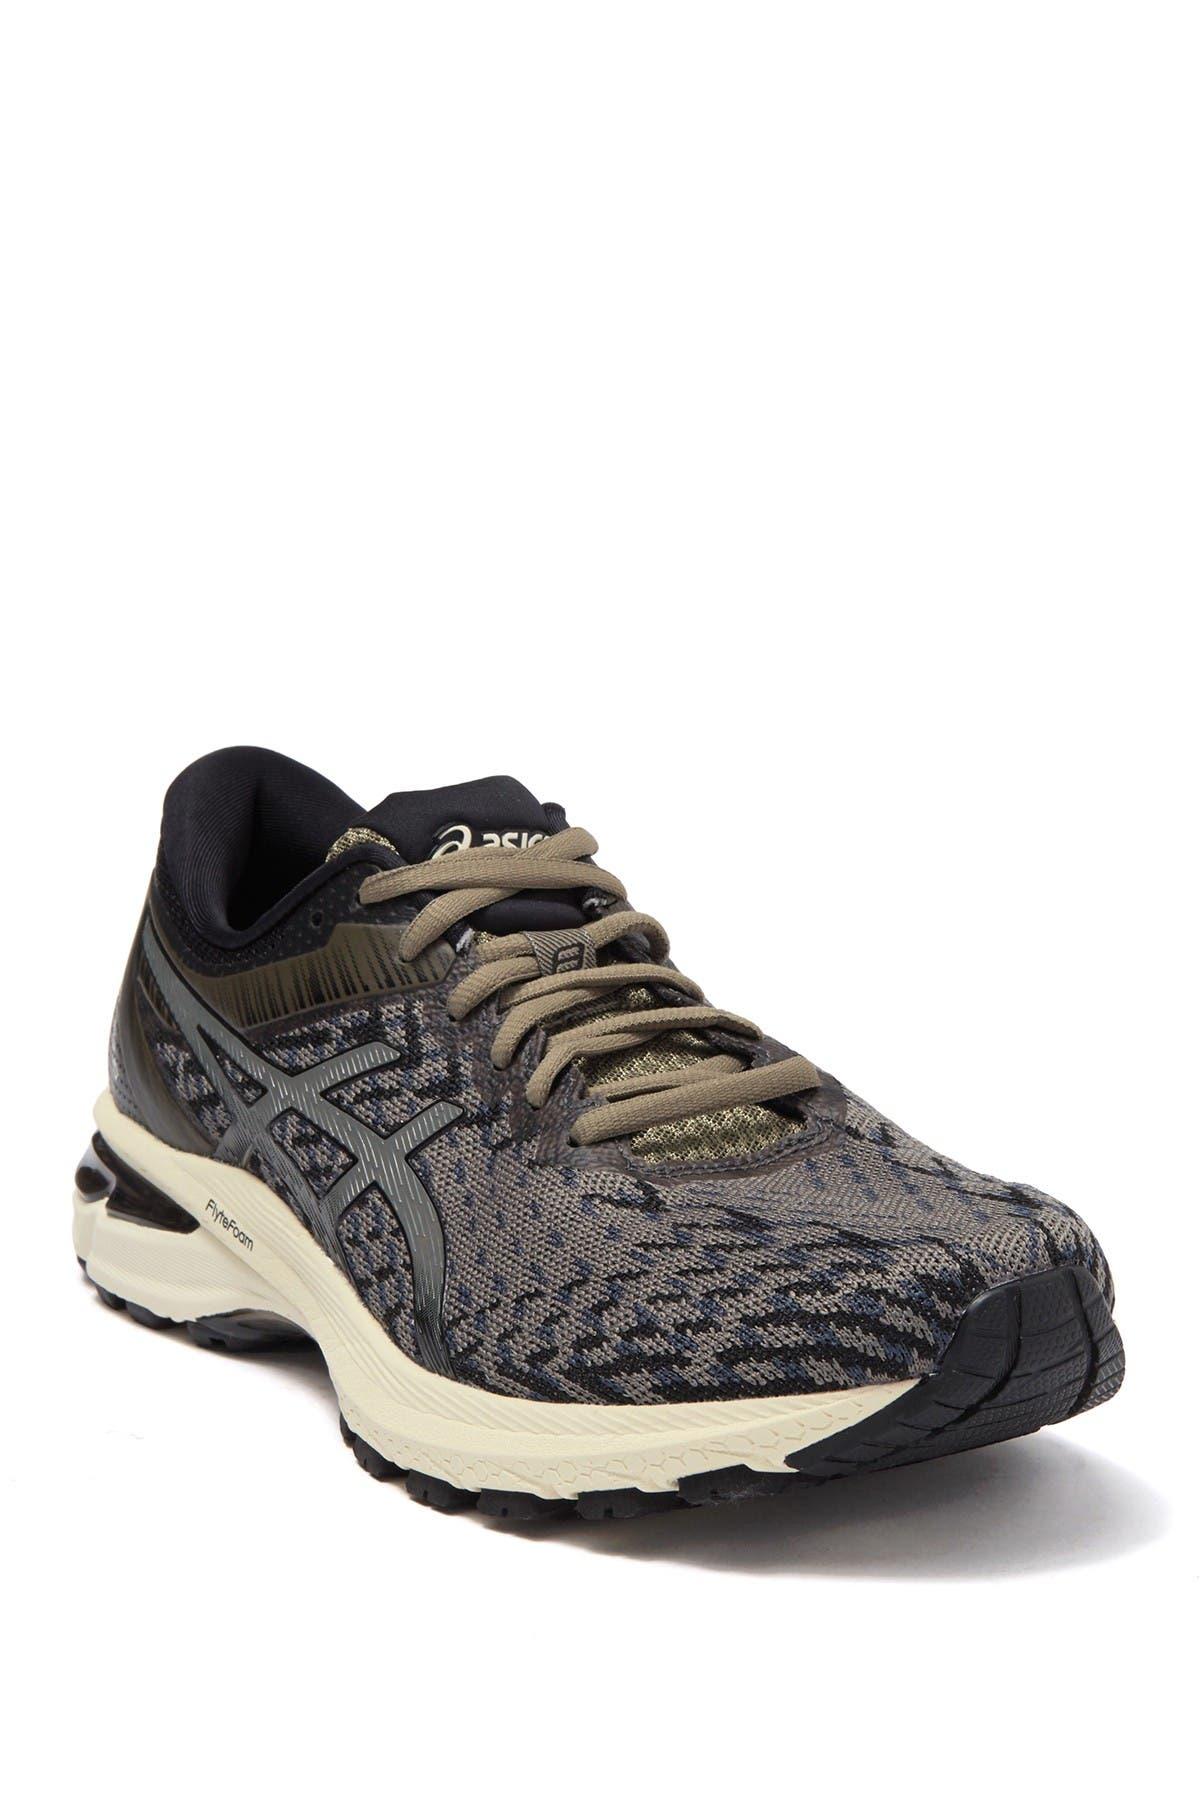 Image of ASICS GT-2000 8 Knit Sneaker